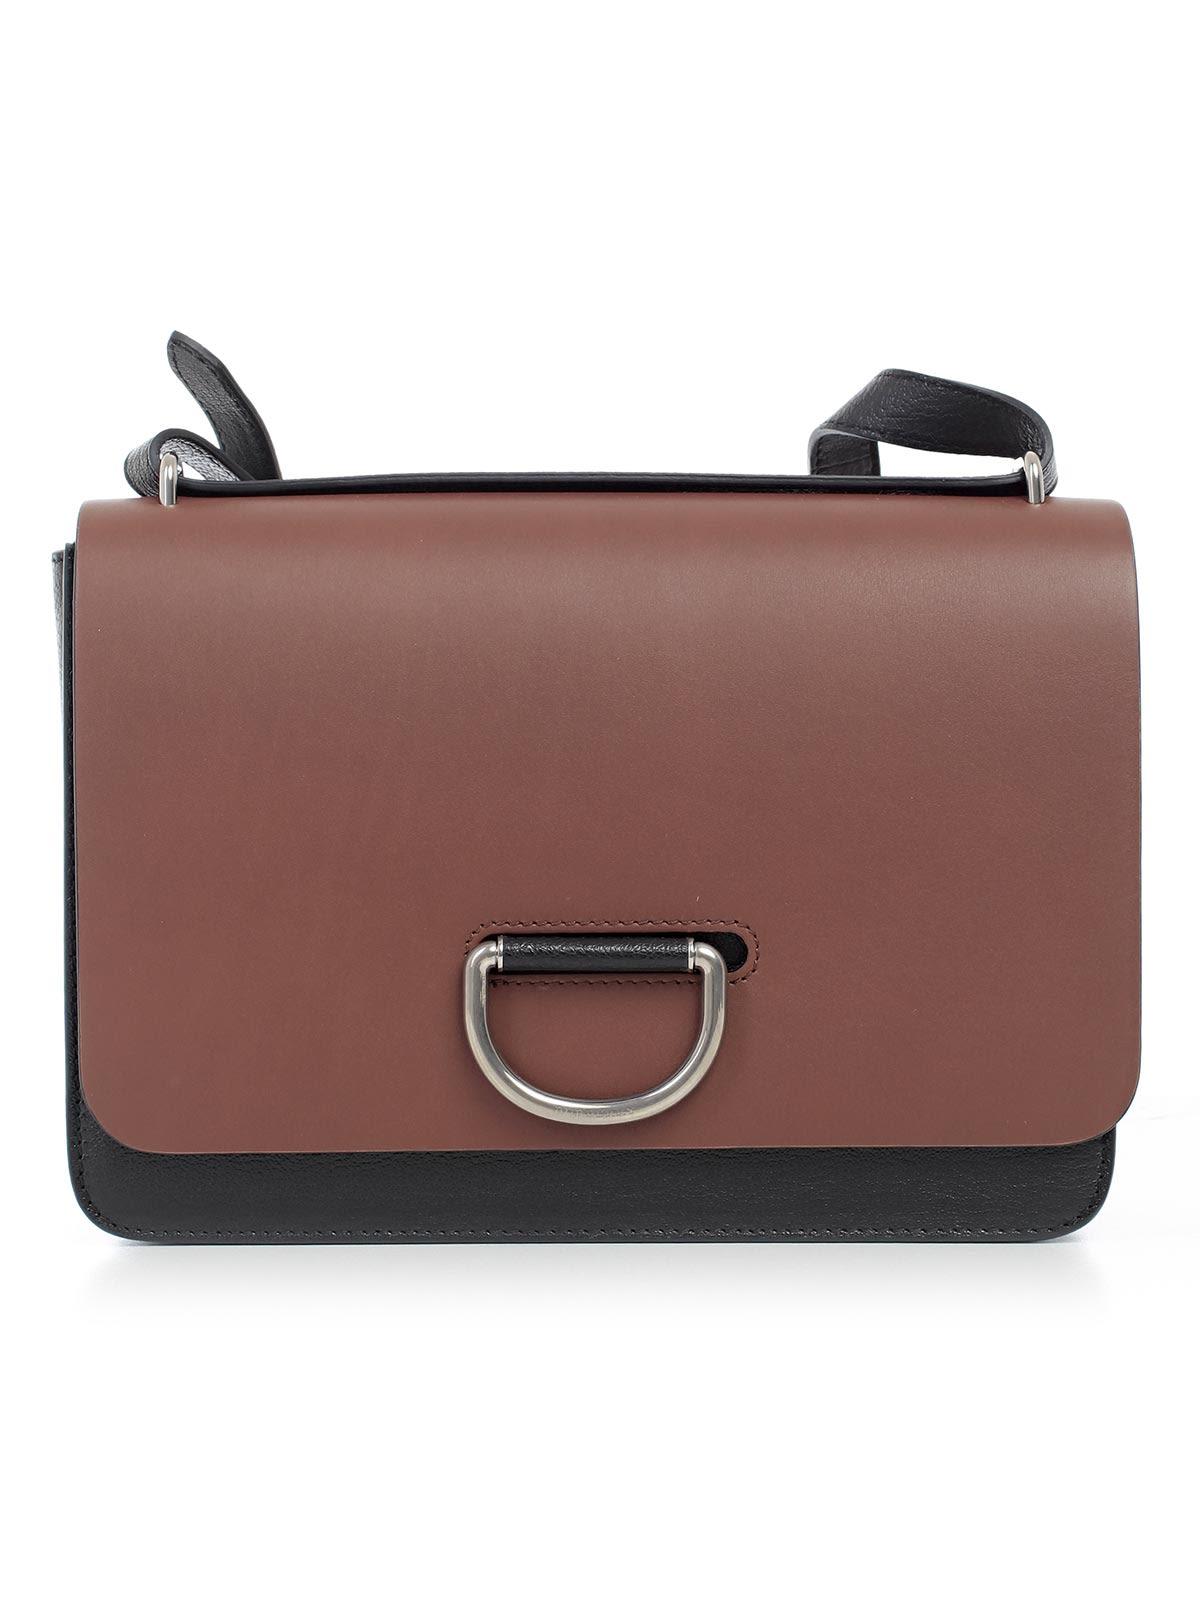 98afdb76ee5f Burberry Burberry Medium D-ring Shoulder Bag - Basic - 10662081 ...